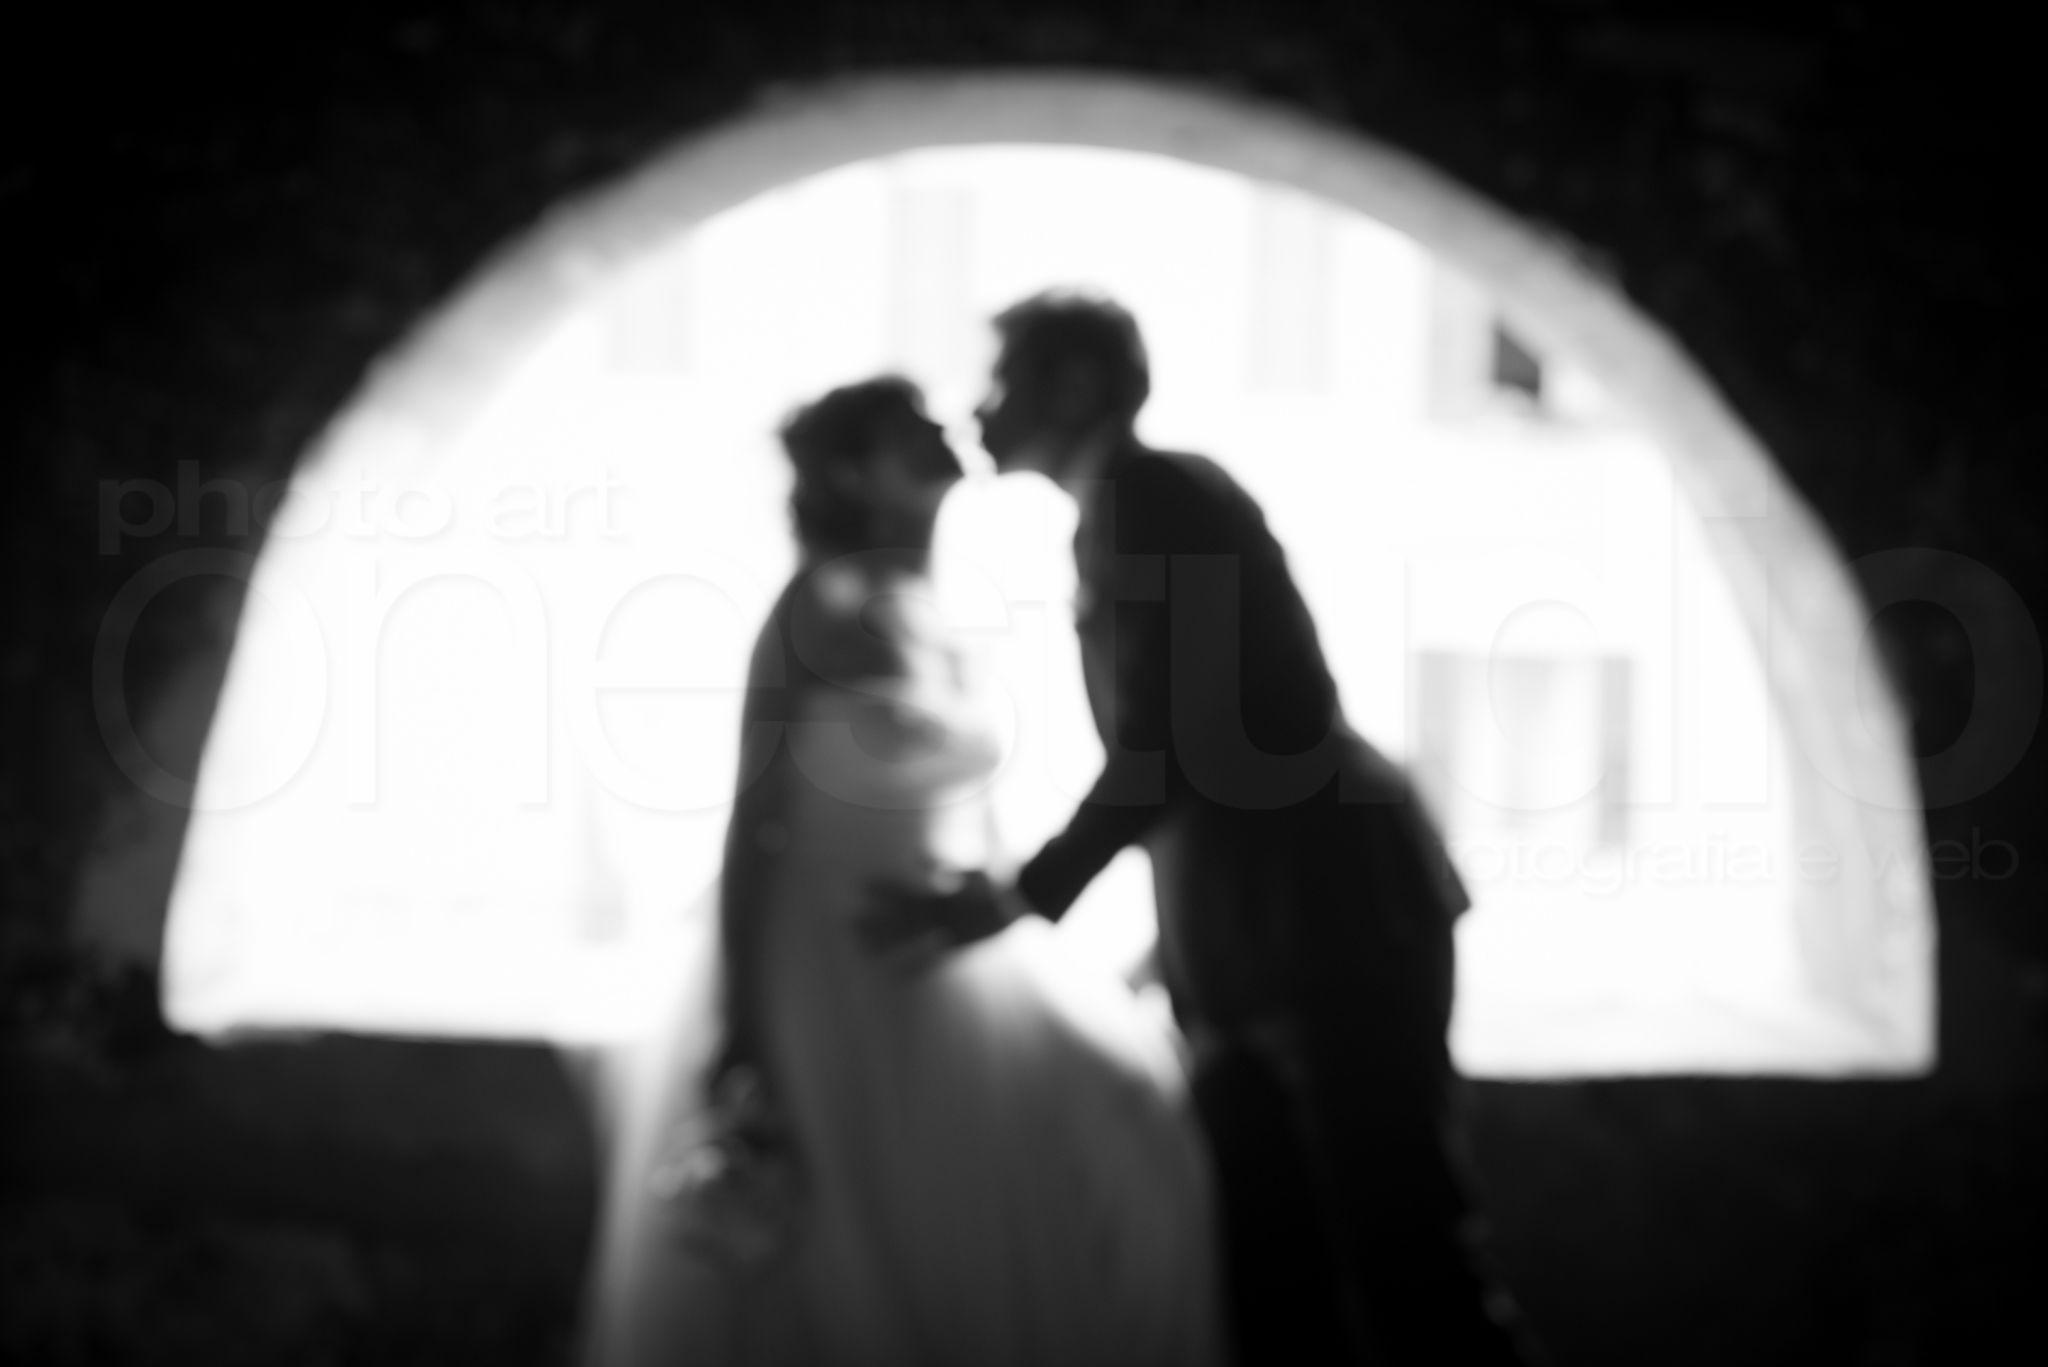 http://lnx.mirkone.it/wp-content/uploads/2015/07/fotografo-matrimoni-faenza-0022.jpg